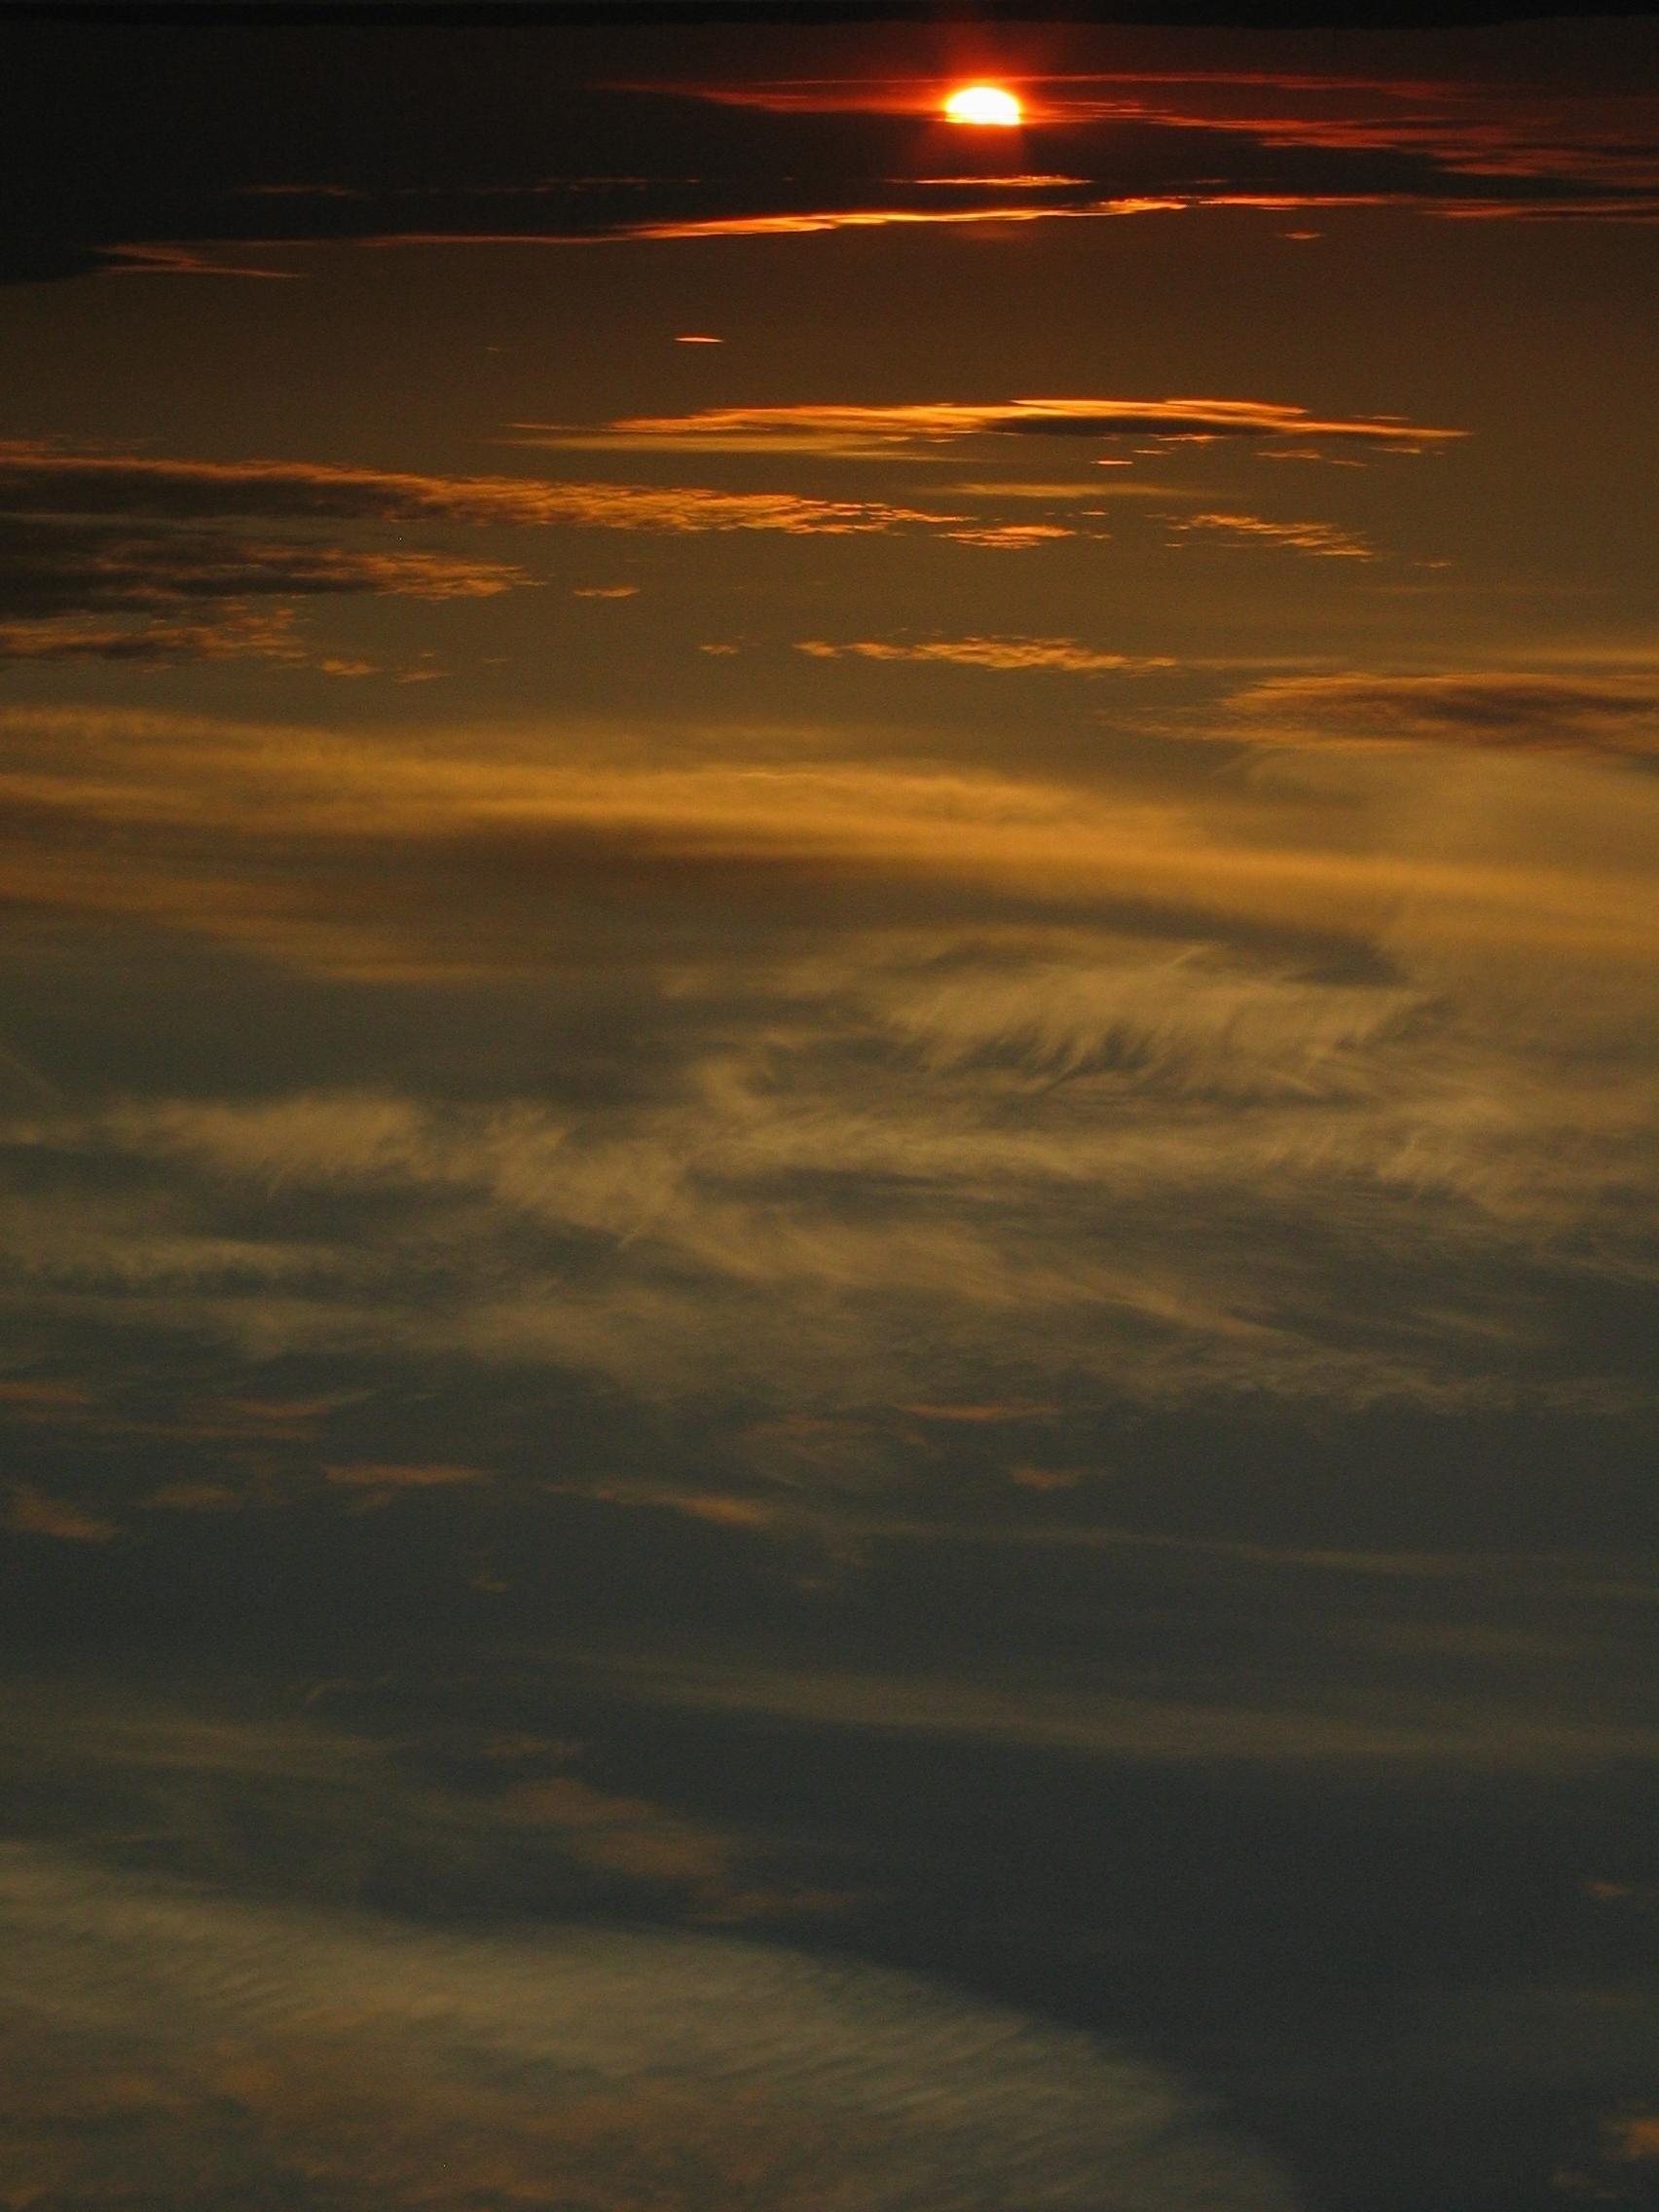 Sunset turned upsidedown